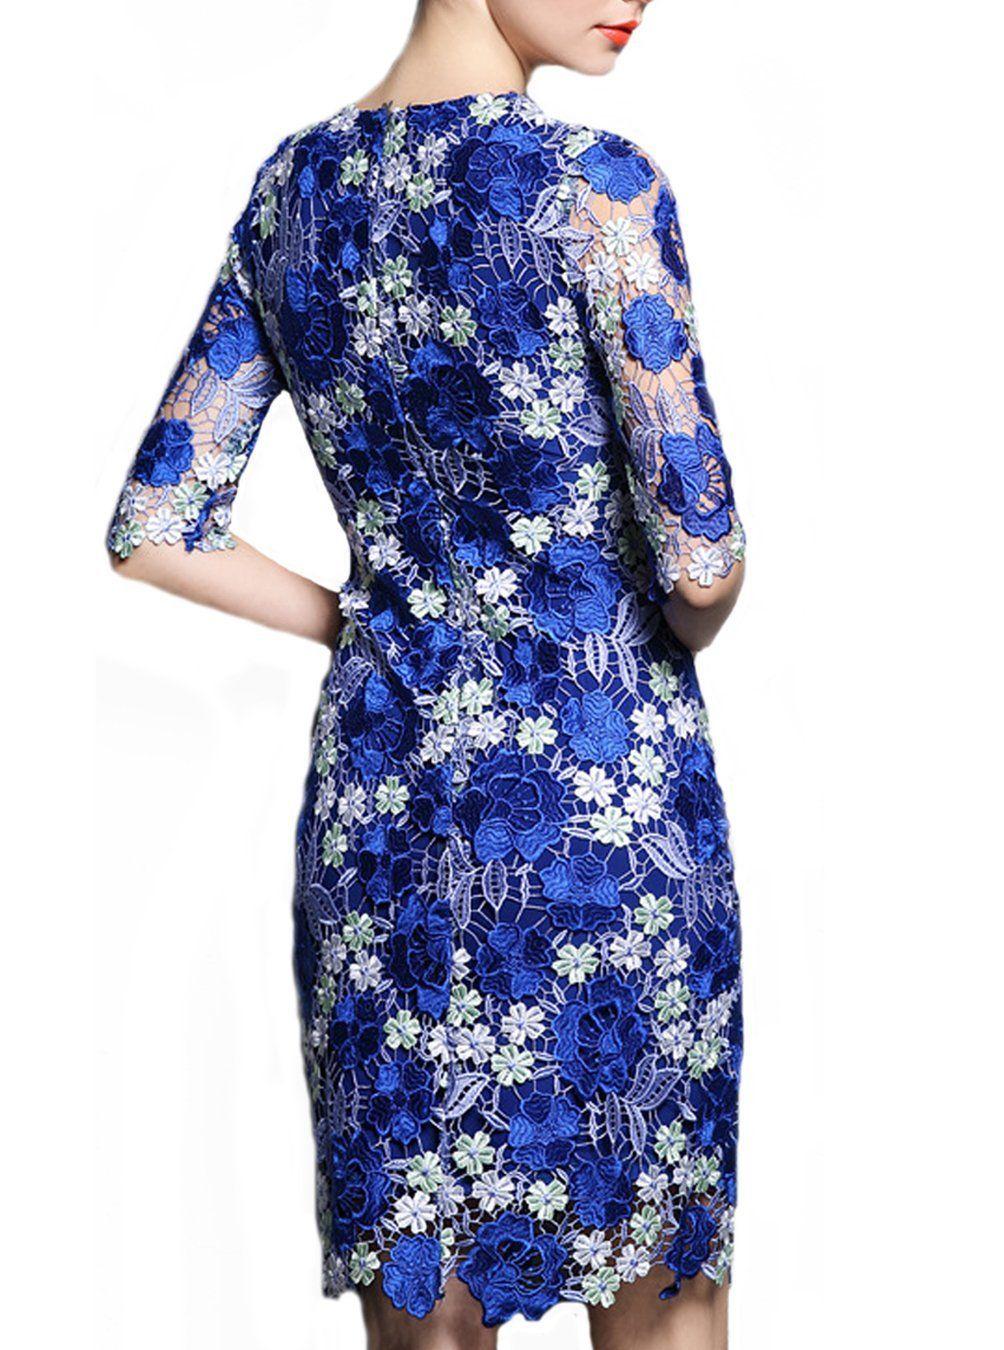 Viva la womenus midlength sleeves scoop tulle with embroidery prom